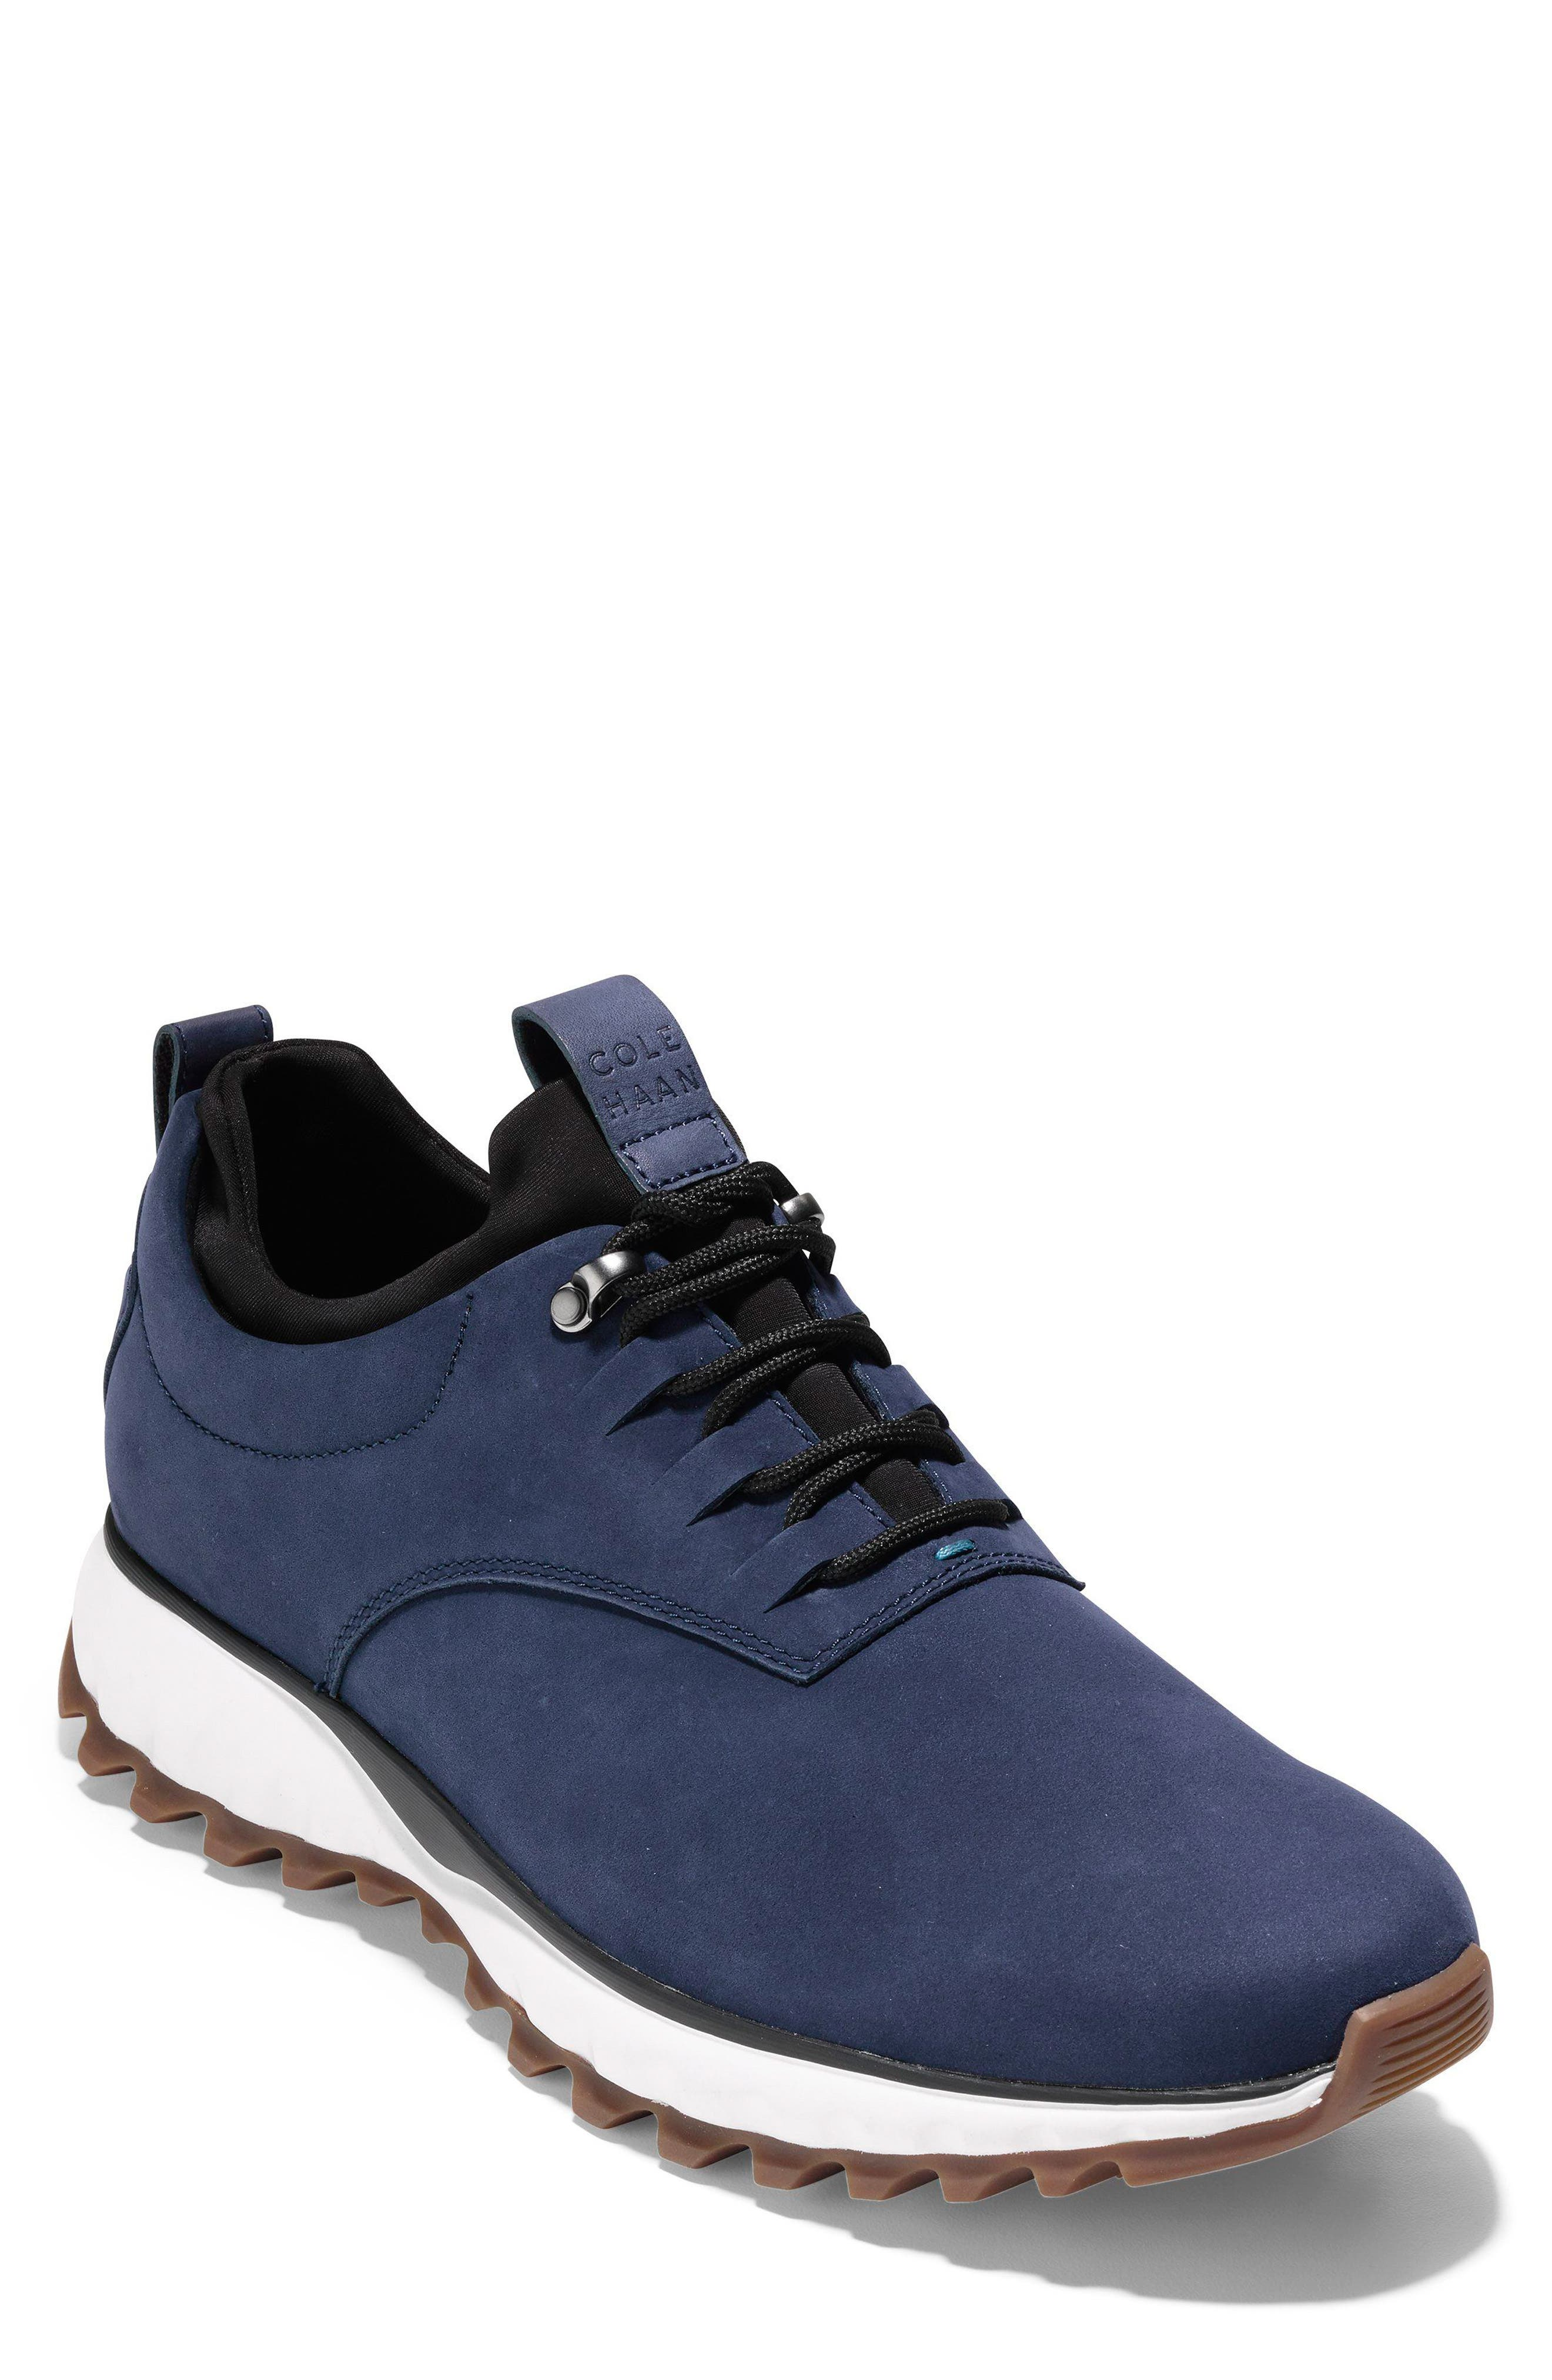 GrandExpløre All Terrain Waterproof Sneaker,                             Main thumbnail 1, color,                             Marine Blue Nubuck